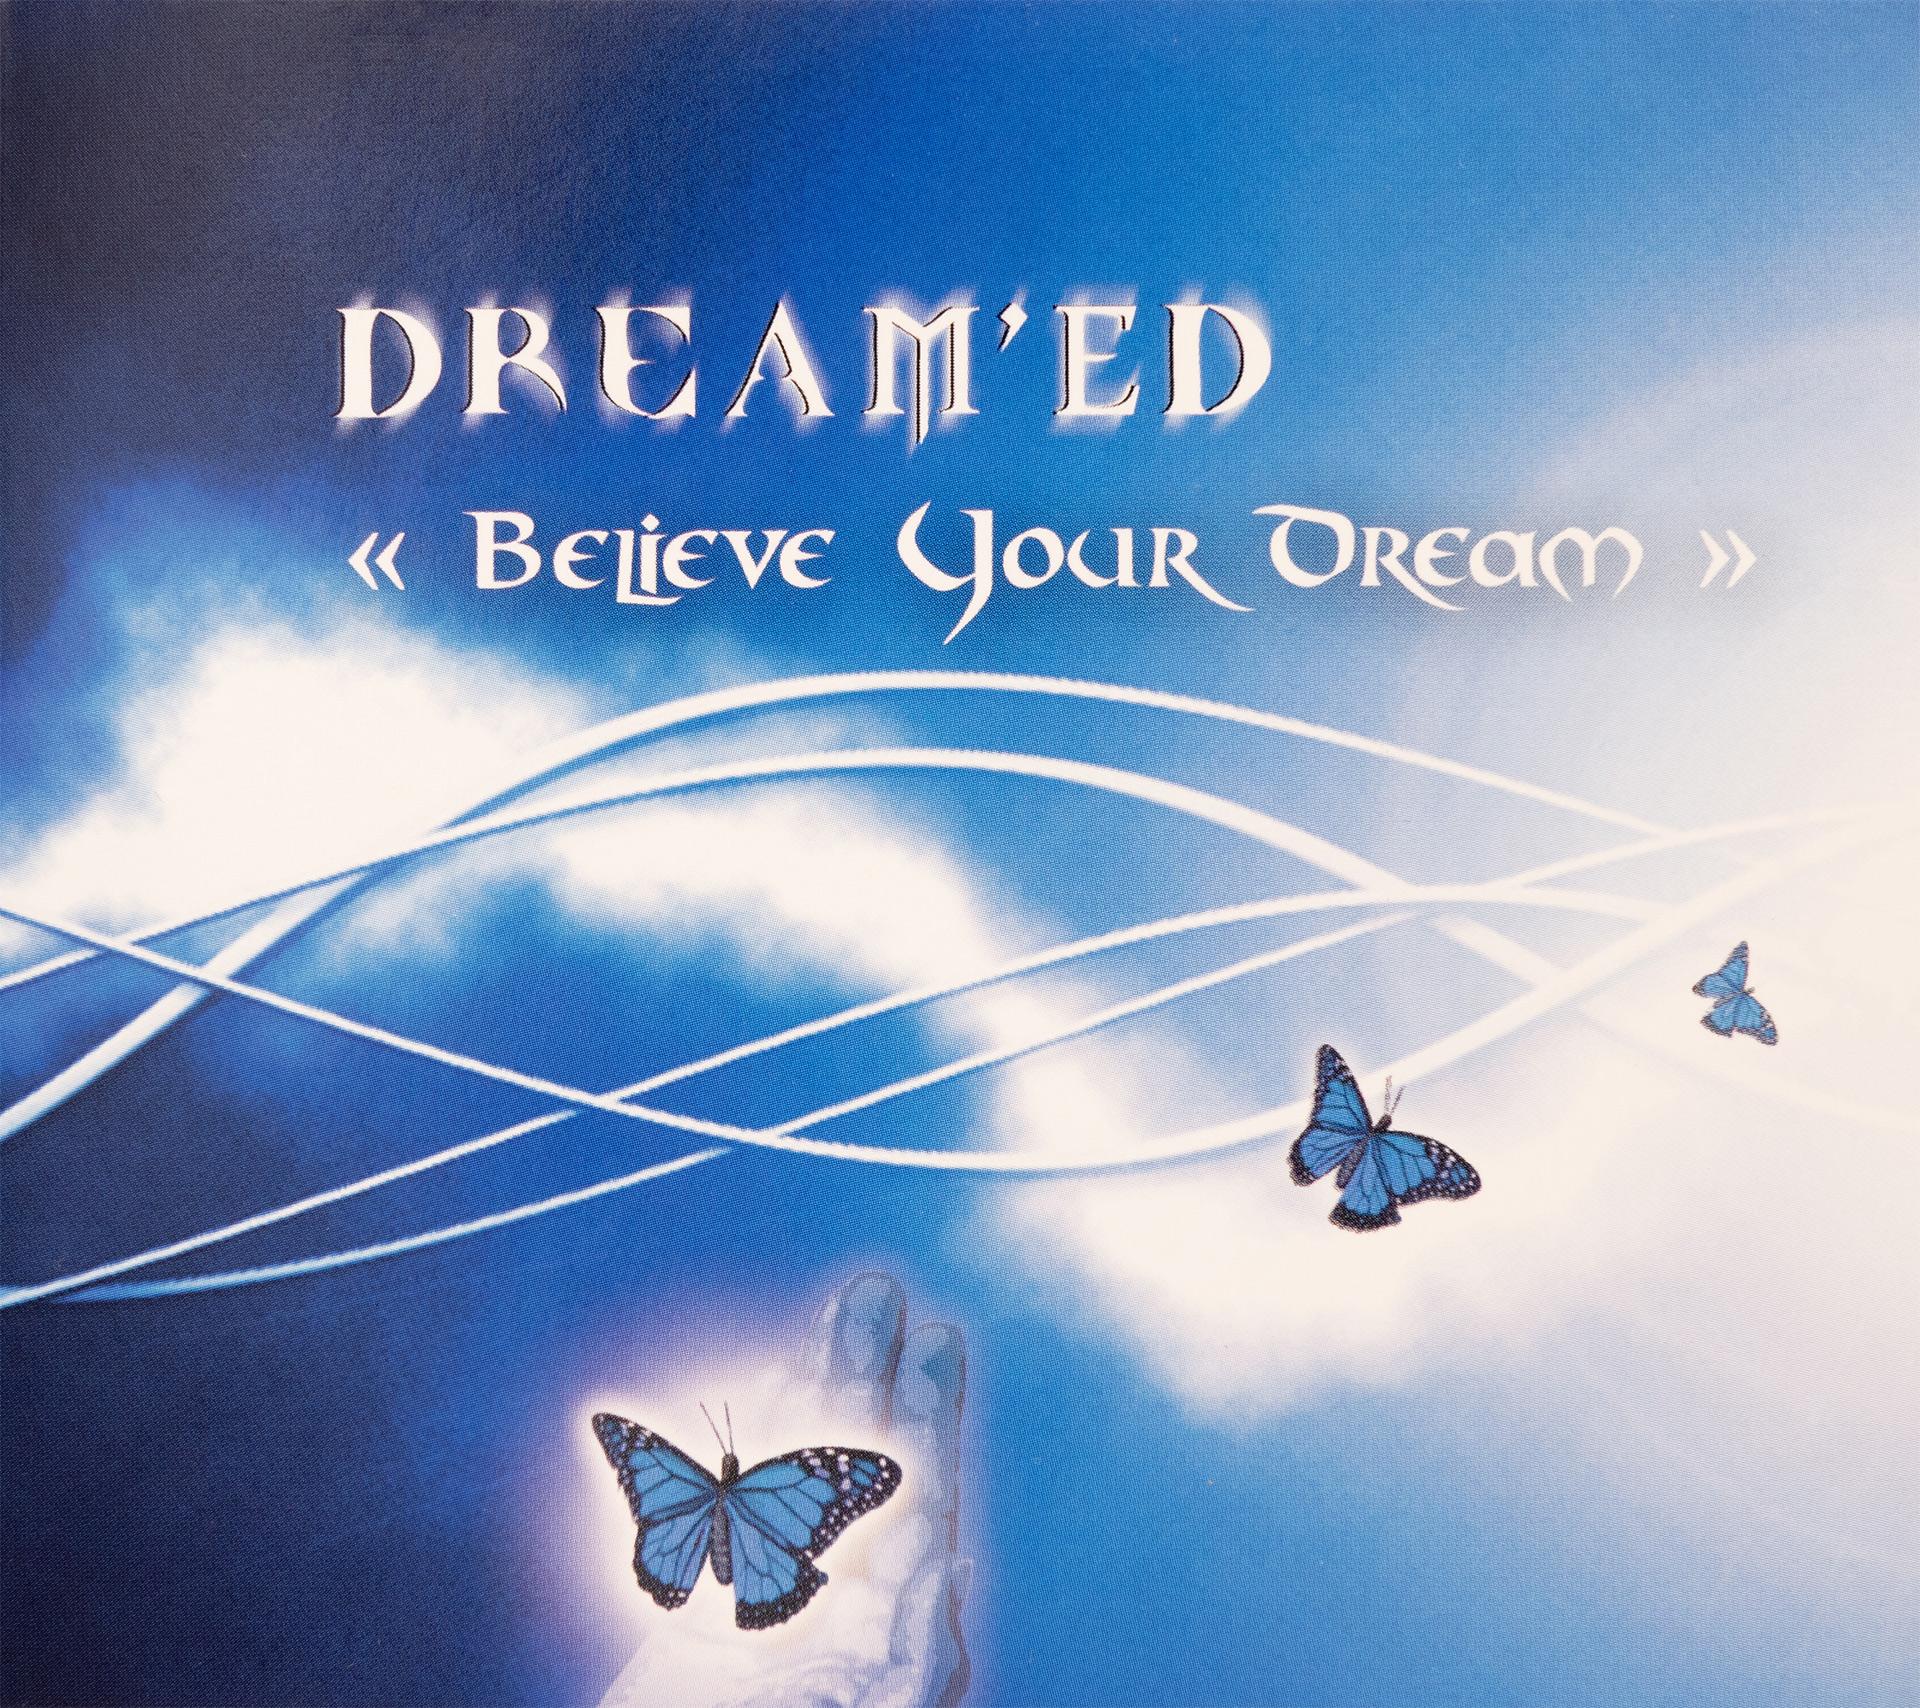 Believe Your Dream - Dream'Ed